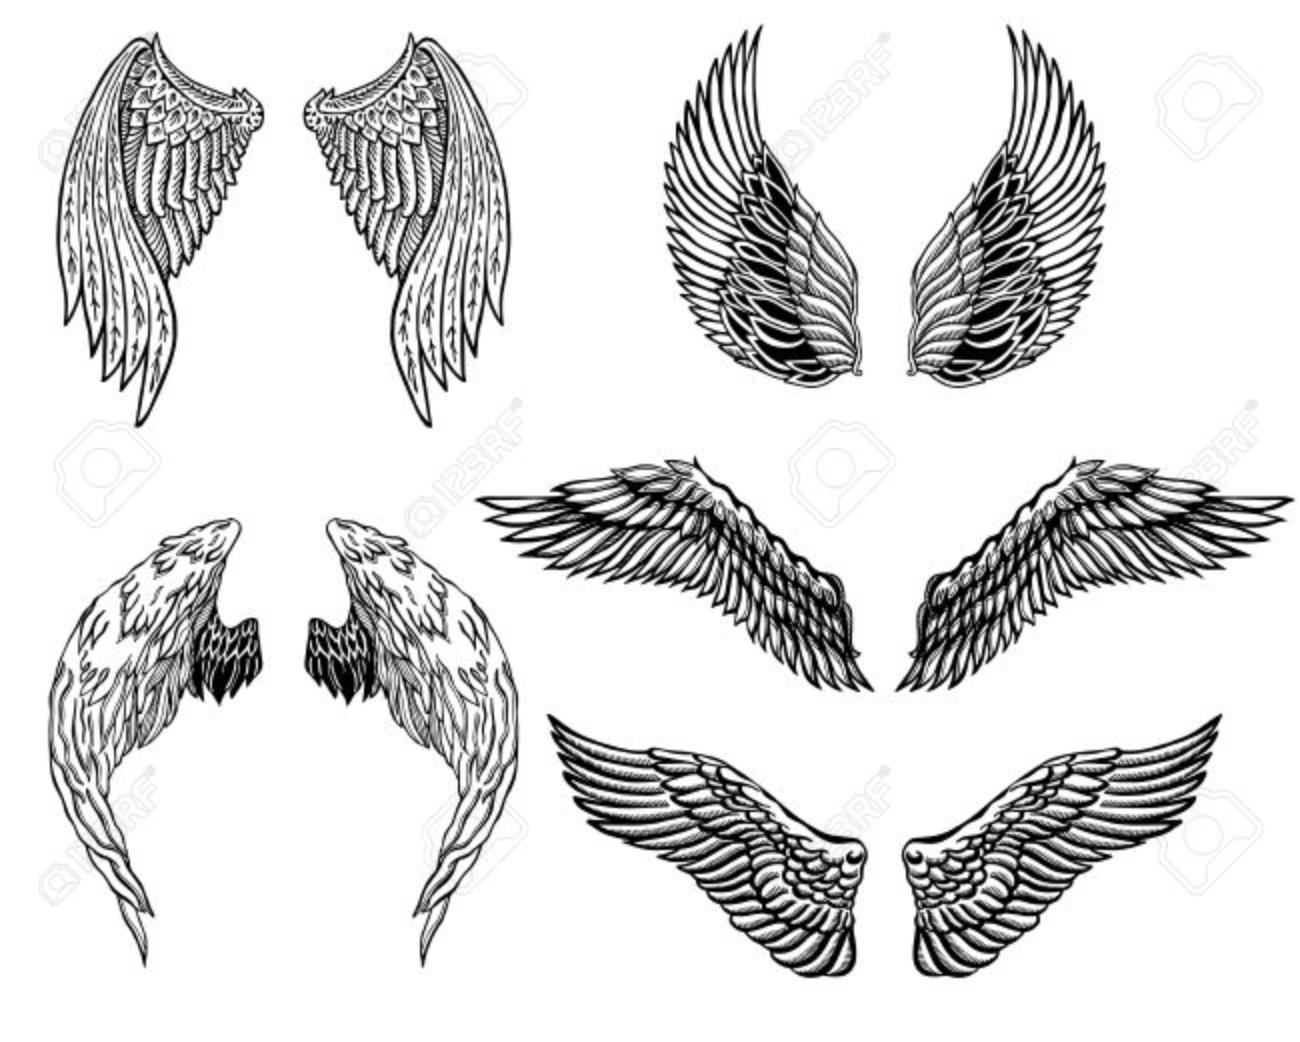 Heráldica Alas Fijadas Para El Tatuaje O Diseño De La Mascota